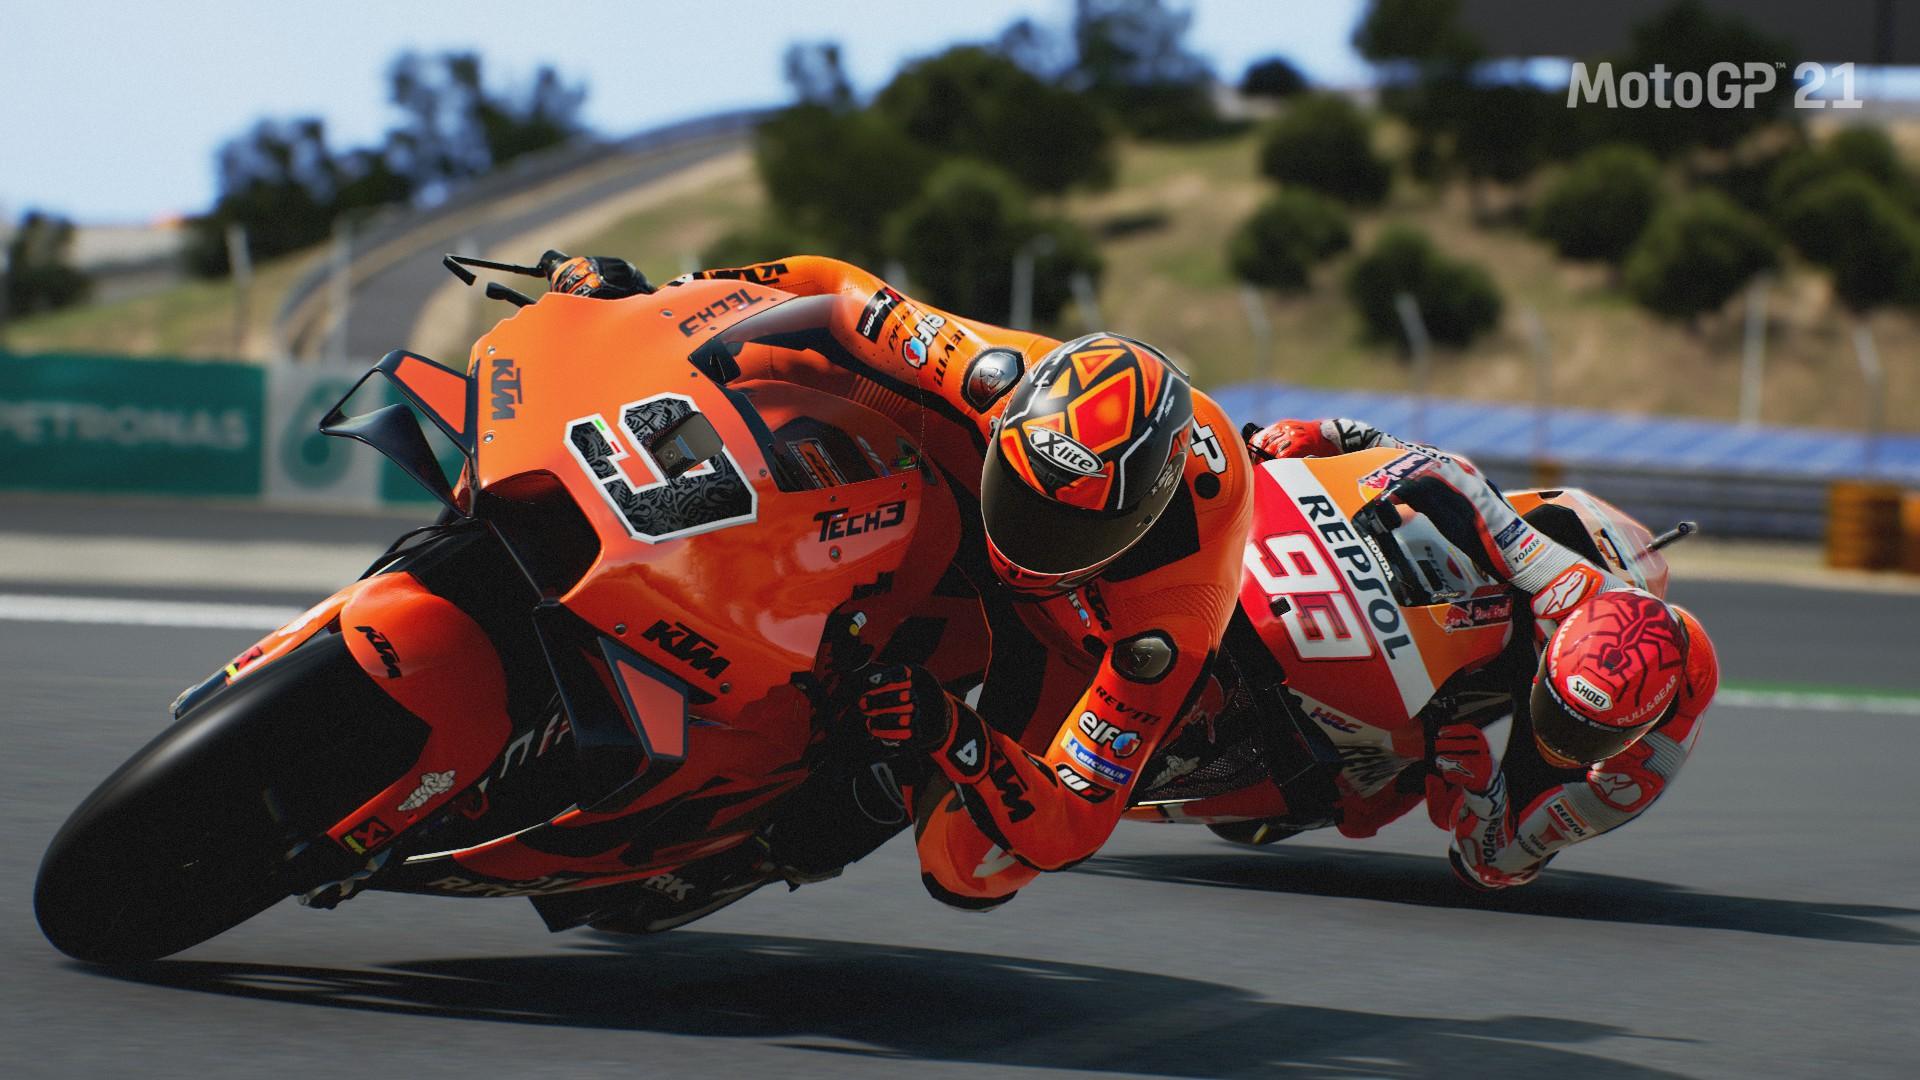 General 1920x1080 Moto GP motorcycle Racing Motorcycle racing Marc Marquez Speed Design Honda KTM Honda RC213V KTM RC16 Danilo Petrucci sport  sports Motorsport vehicle